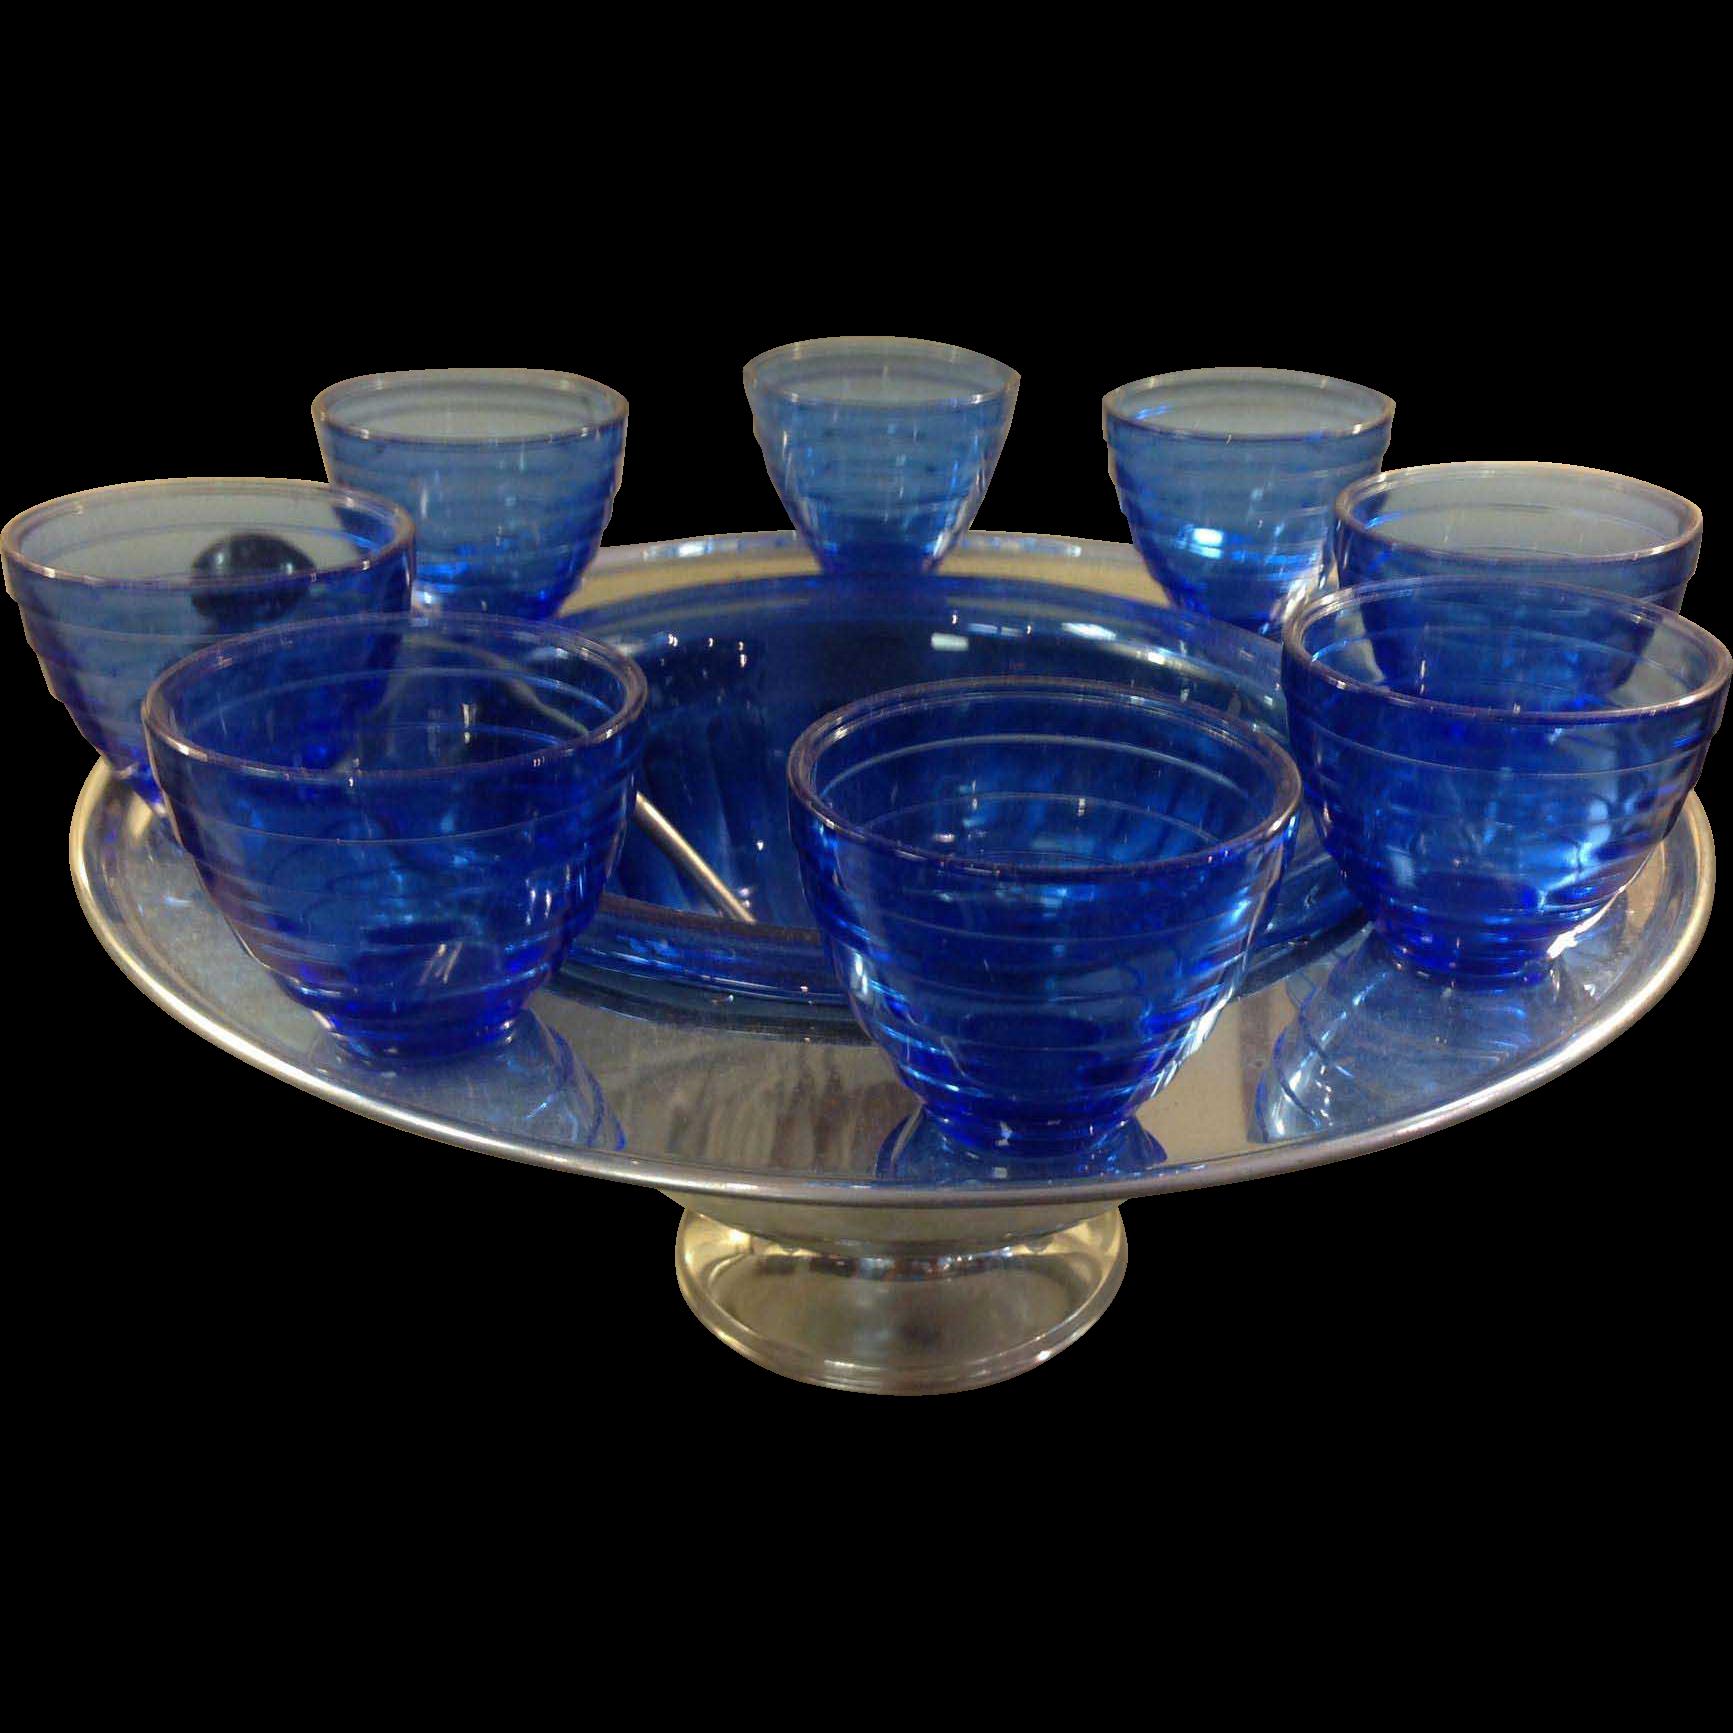 Cobalt Blue Saturn Chrome Punchbowl Set Hazel Atlas, with original Ladle and 8 Punch Cups c.1940